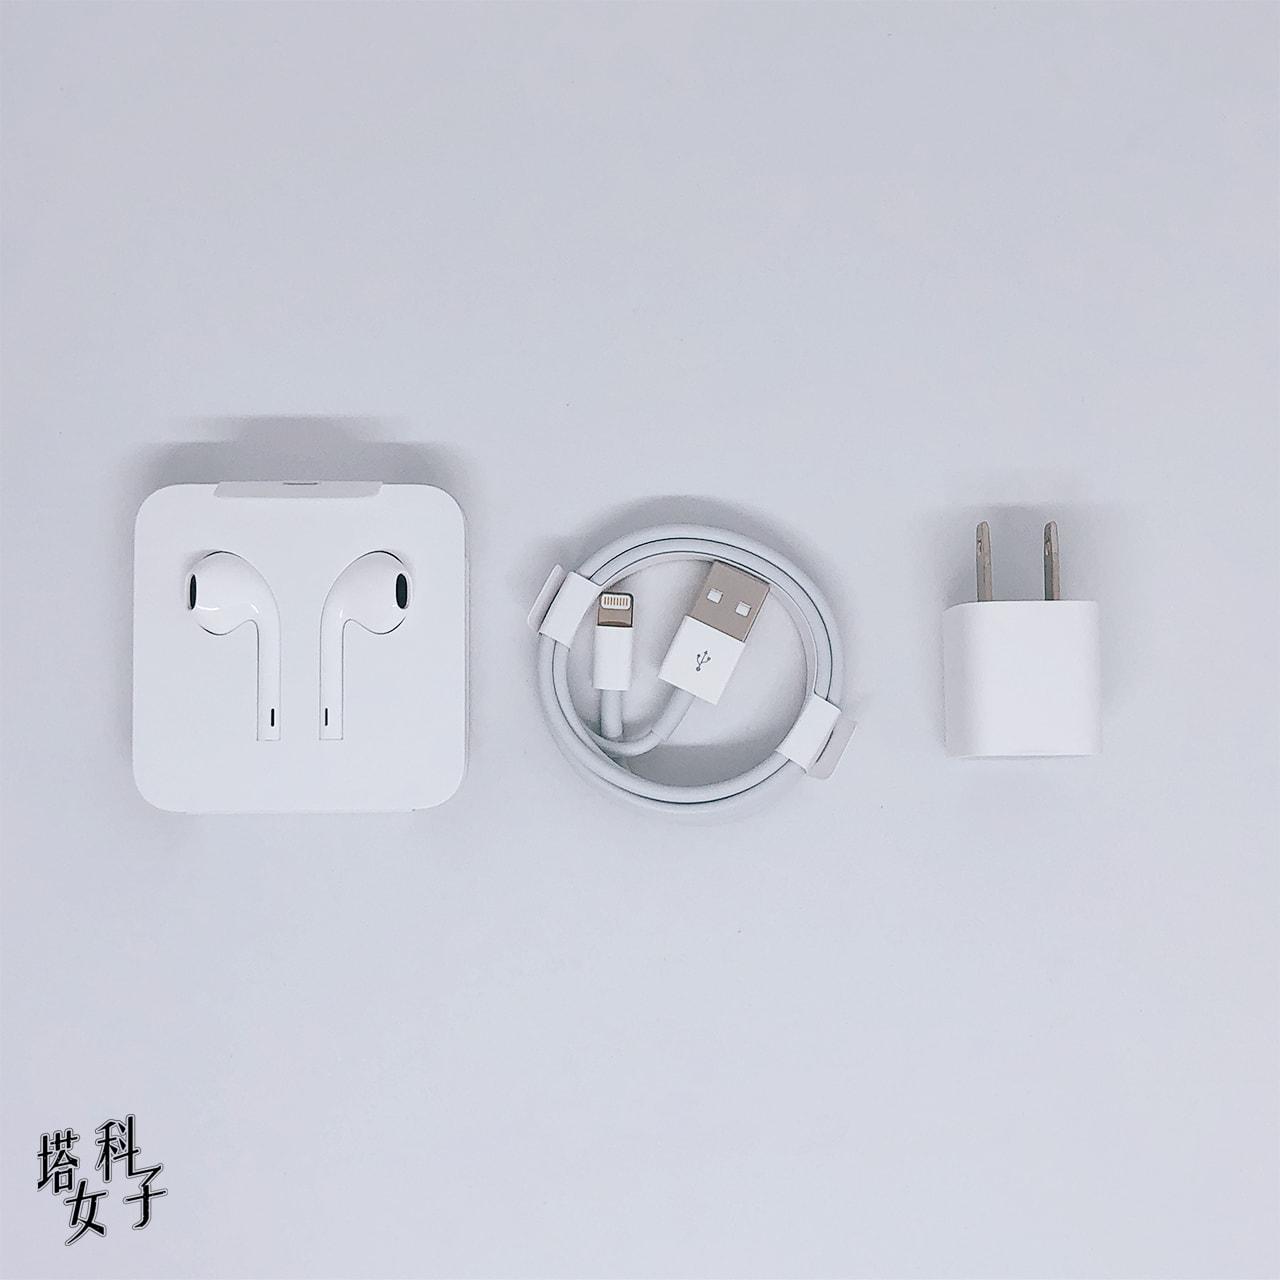 iPhone 11 紫色 開箱評測 - 內容物